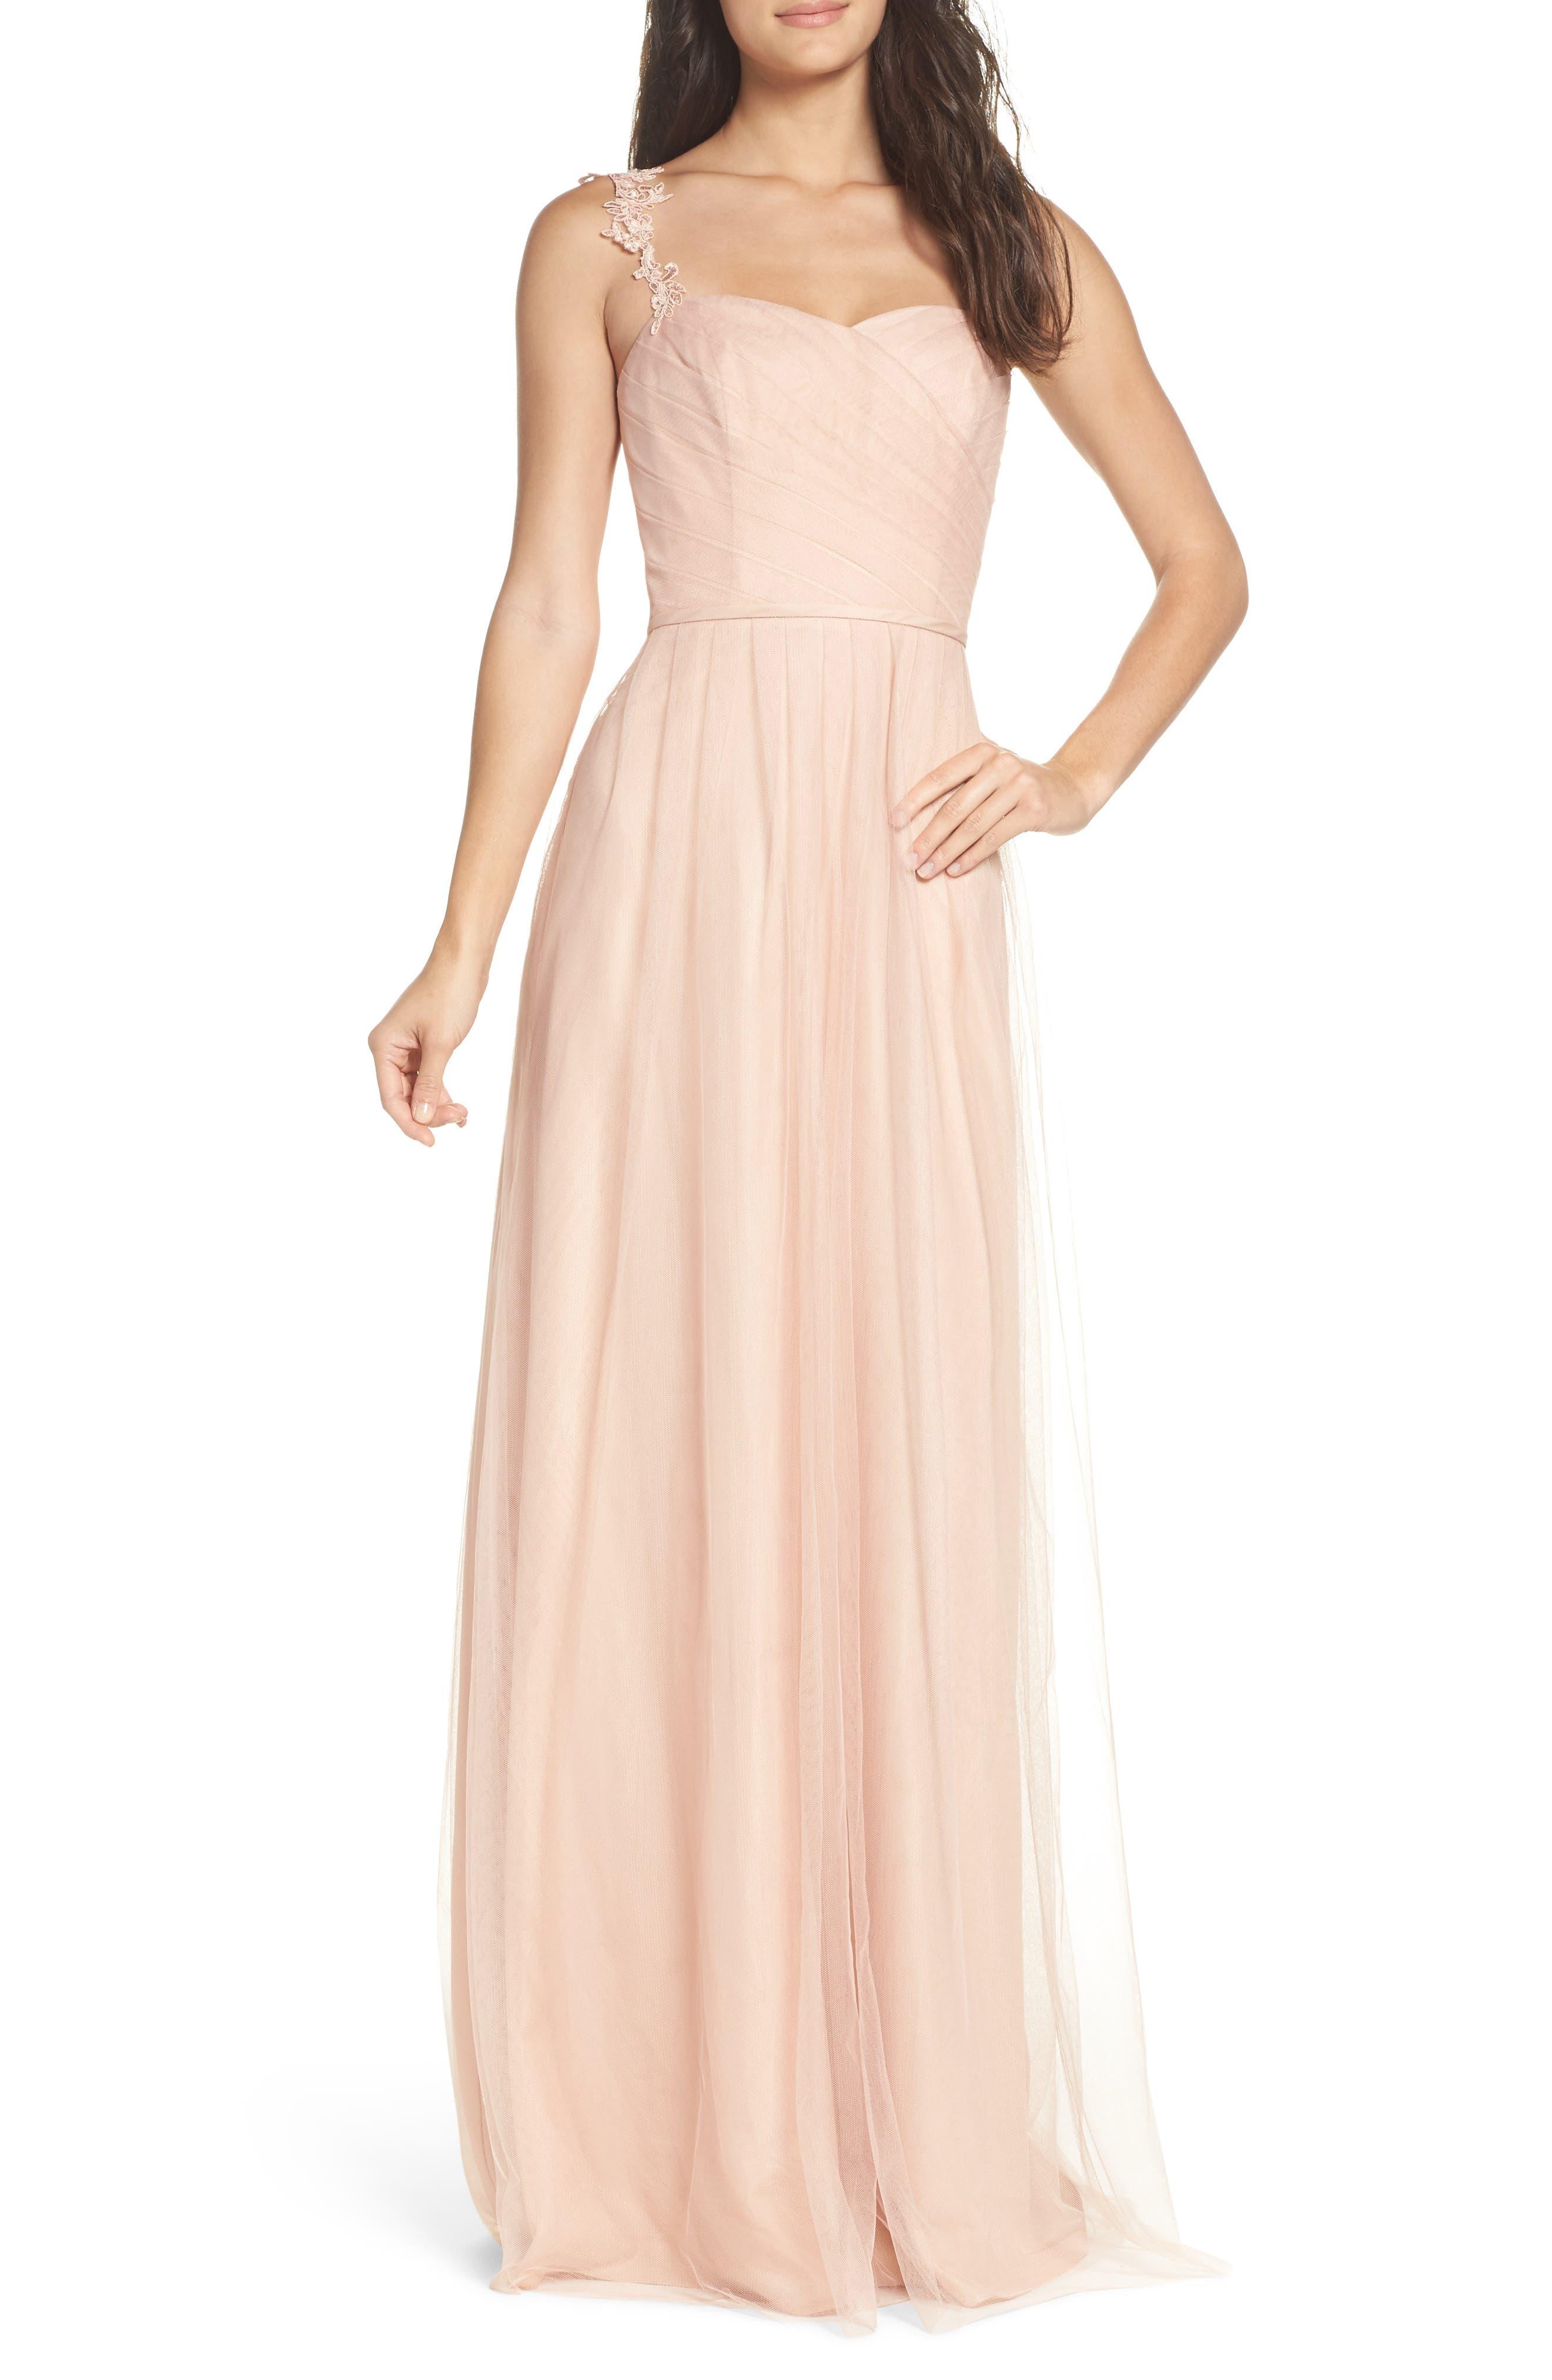 Monique Lhuillier Bridesmaids Violetta Tulle Gown (Nordstrom Exclusive)